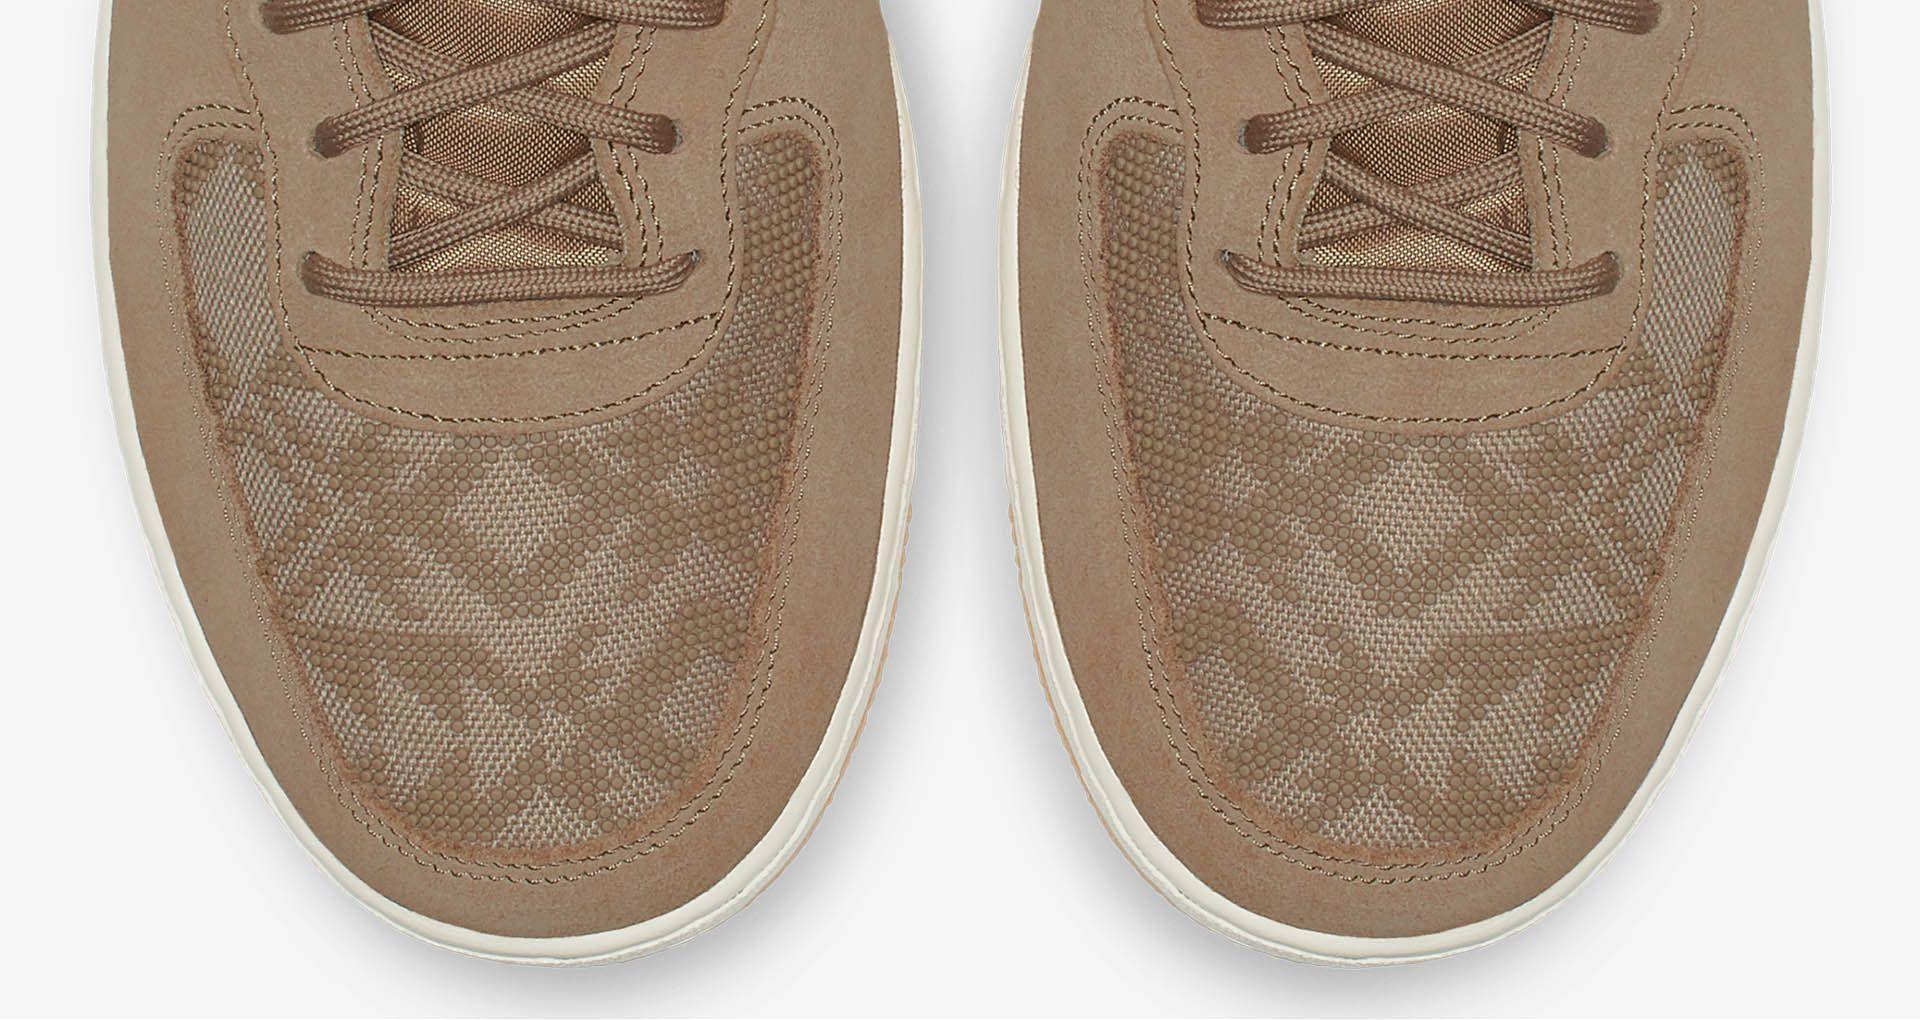 Nike Air Force 1 Premium 'N7' Release Date. Nike SNKRS